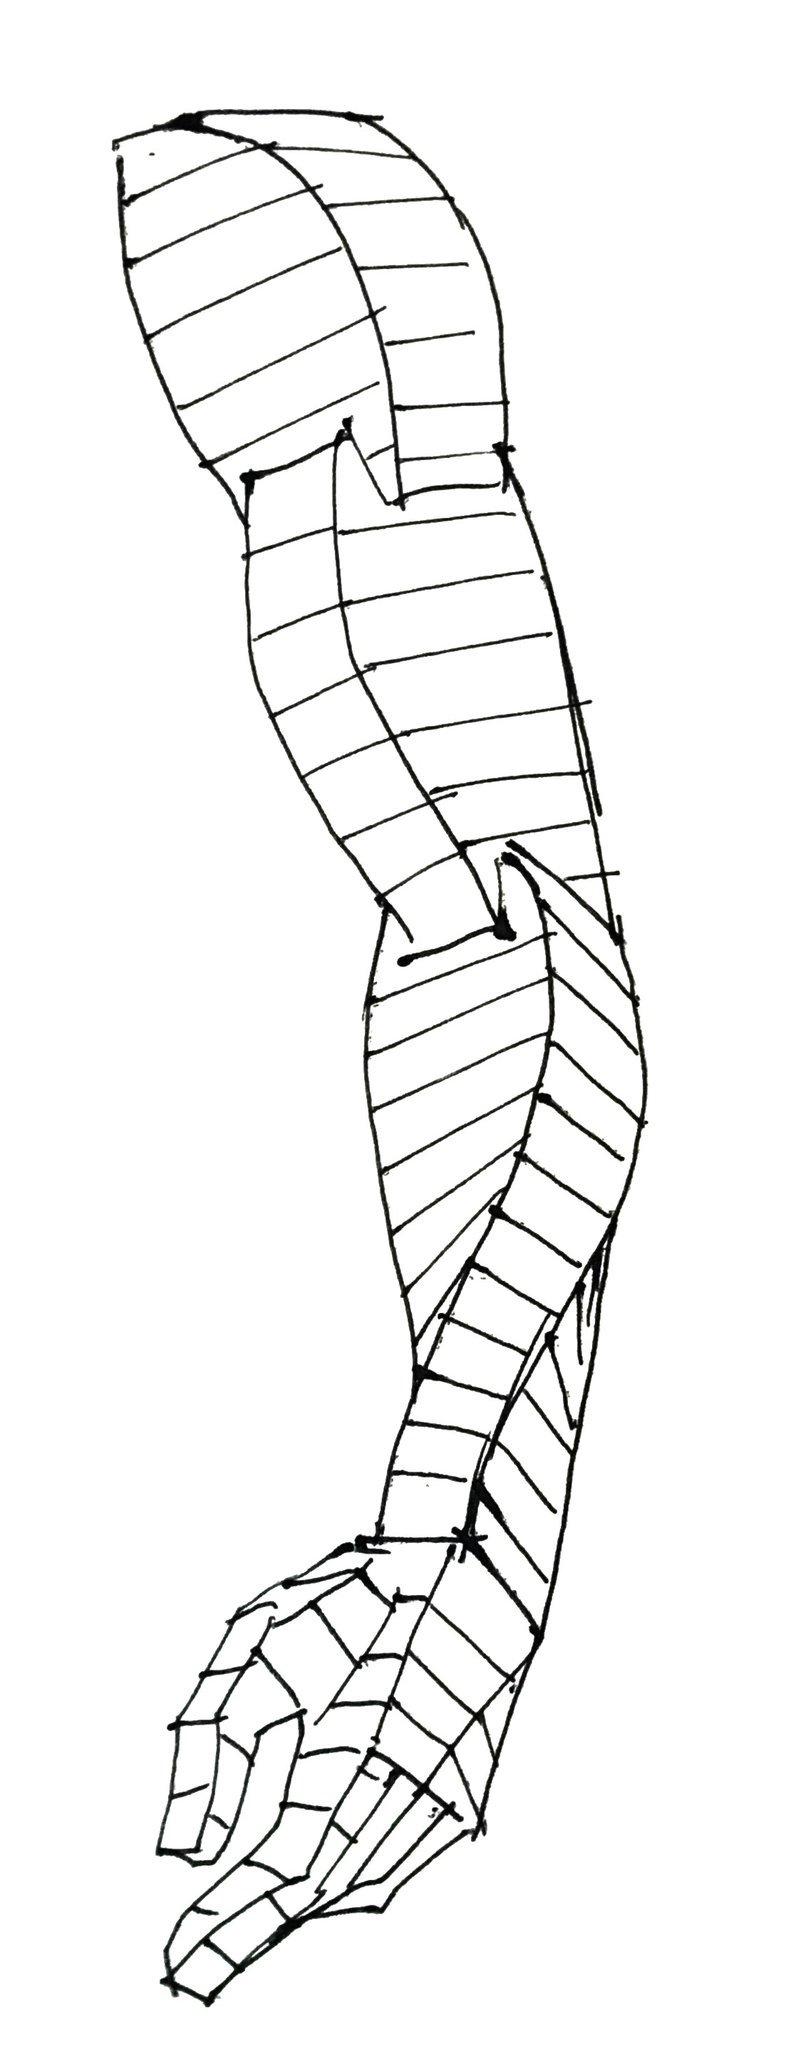 Ejemplo de como a ser un brazo   anatomia   Pinterest   Brazos ...